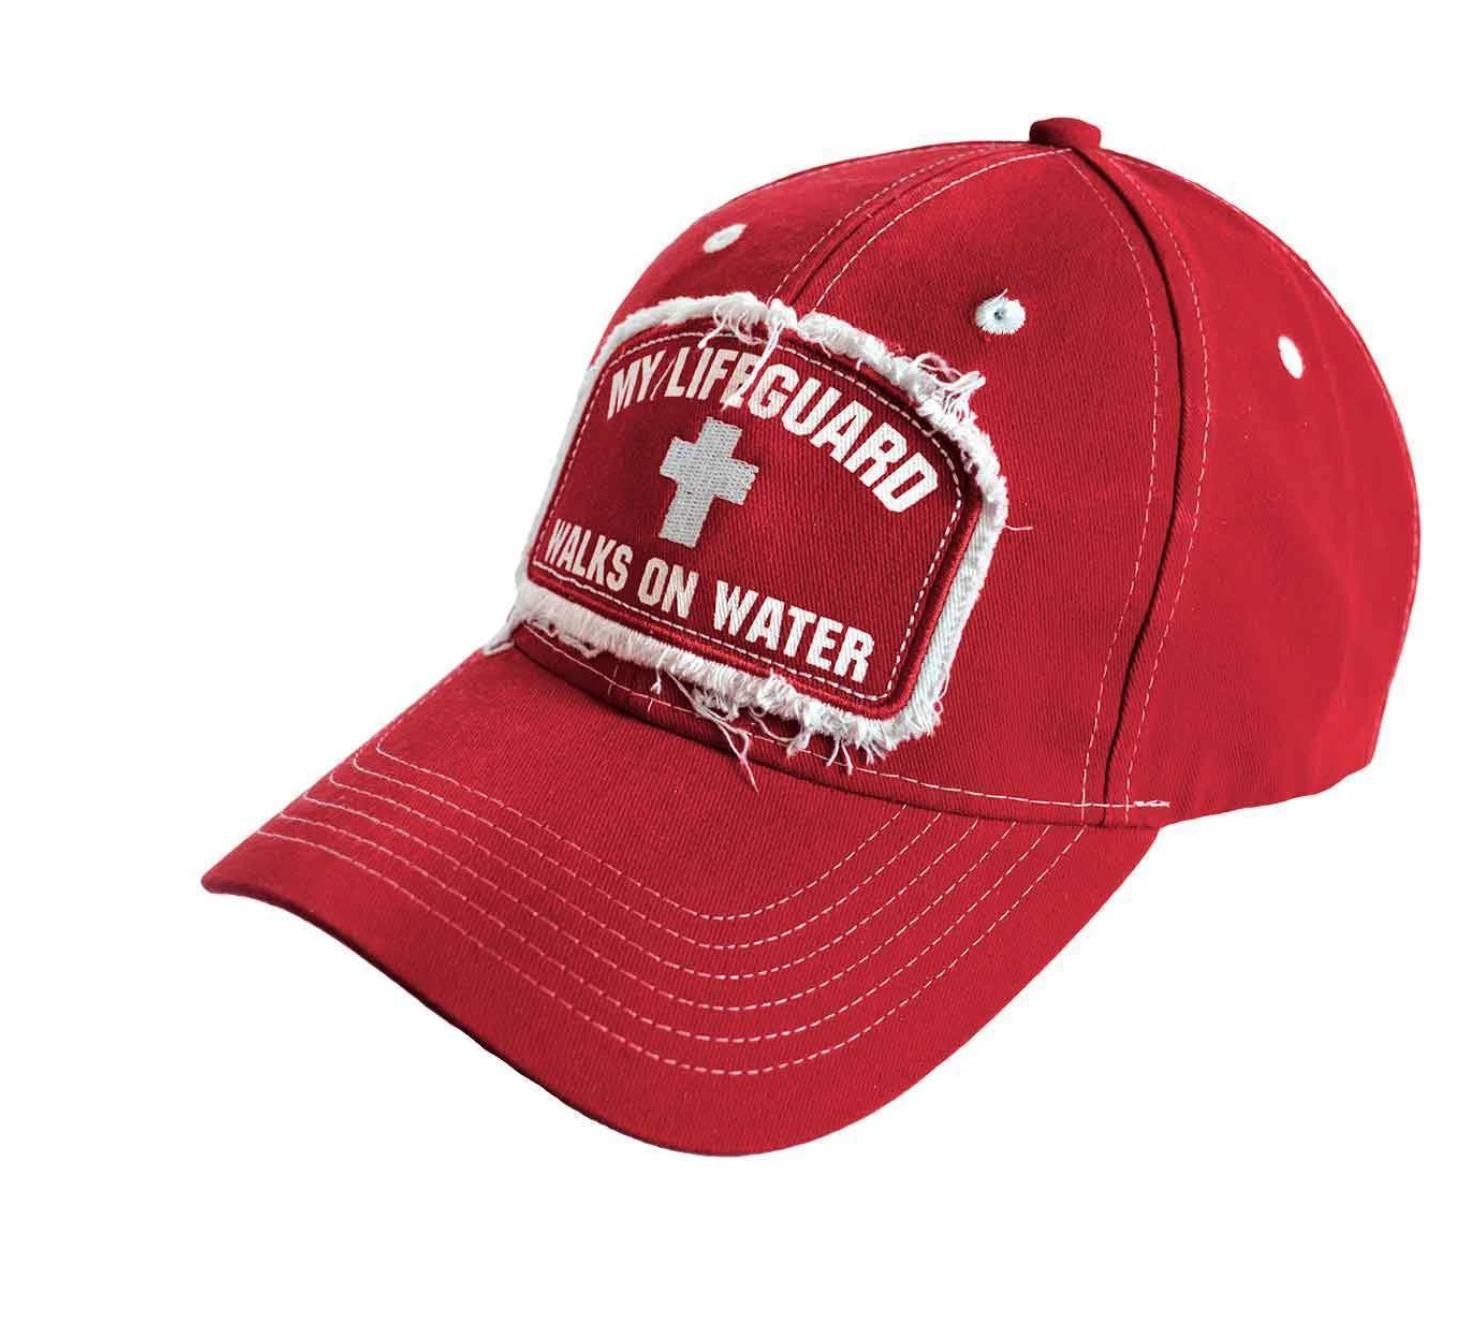 Lifeguard Hat - FREE SHIPPING